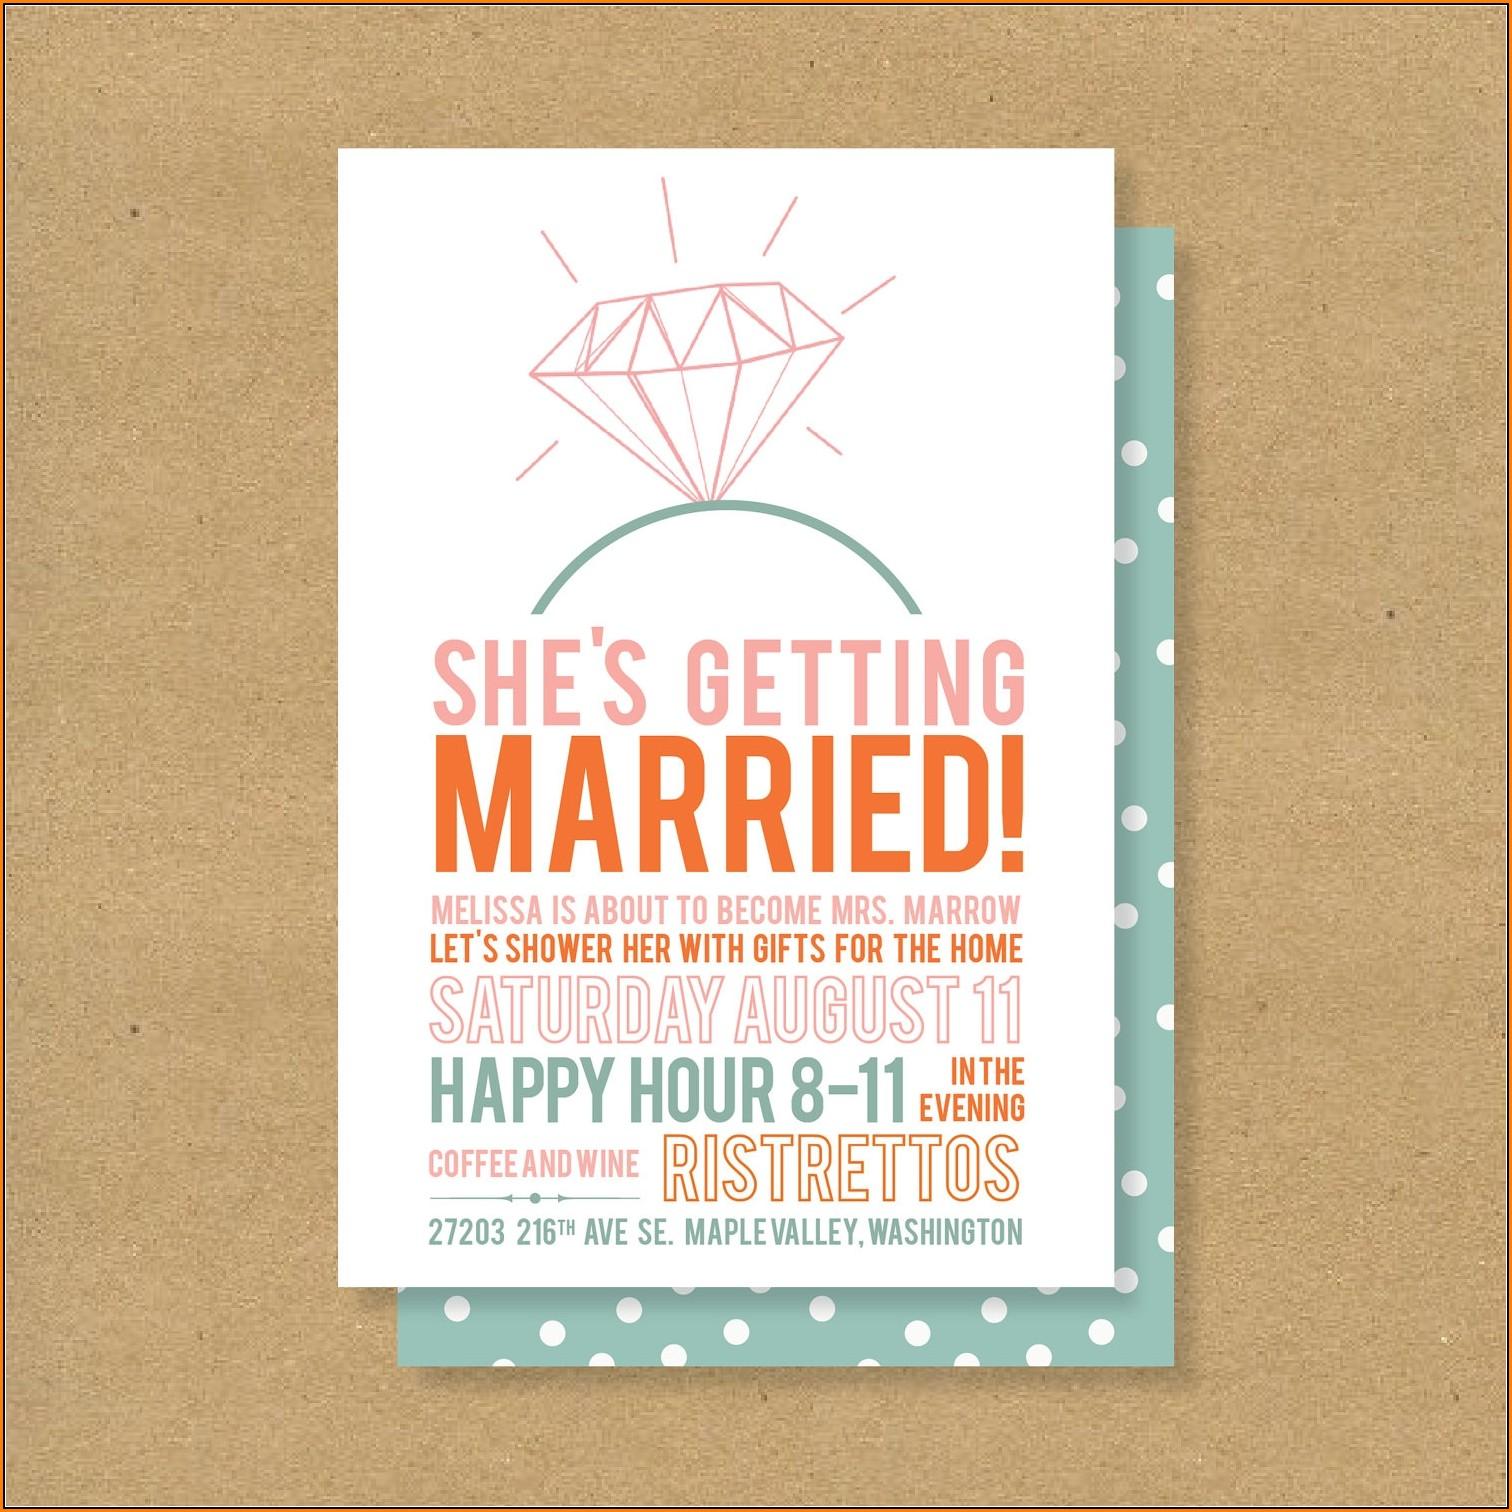 Free Bridal Shower Invitation Templates For Microsoft Word